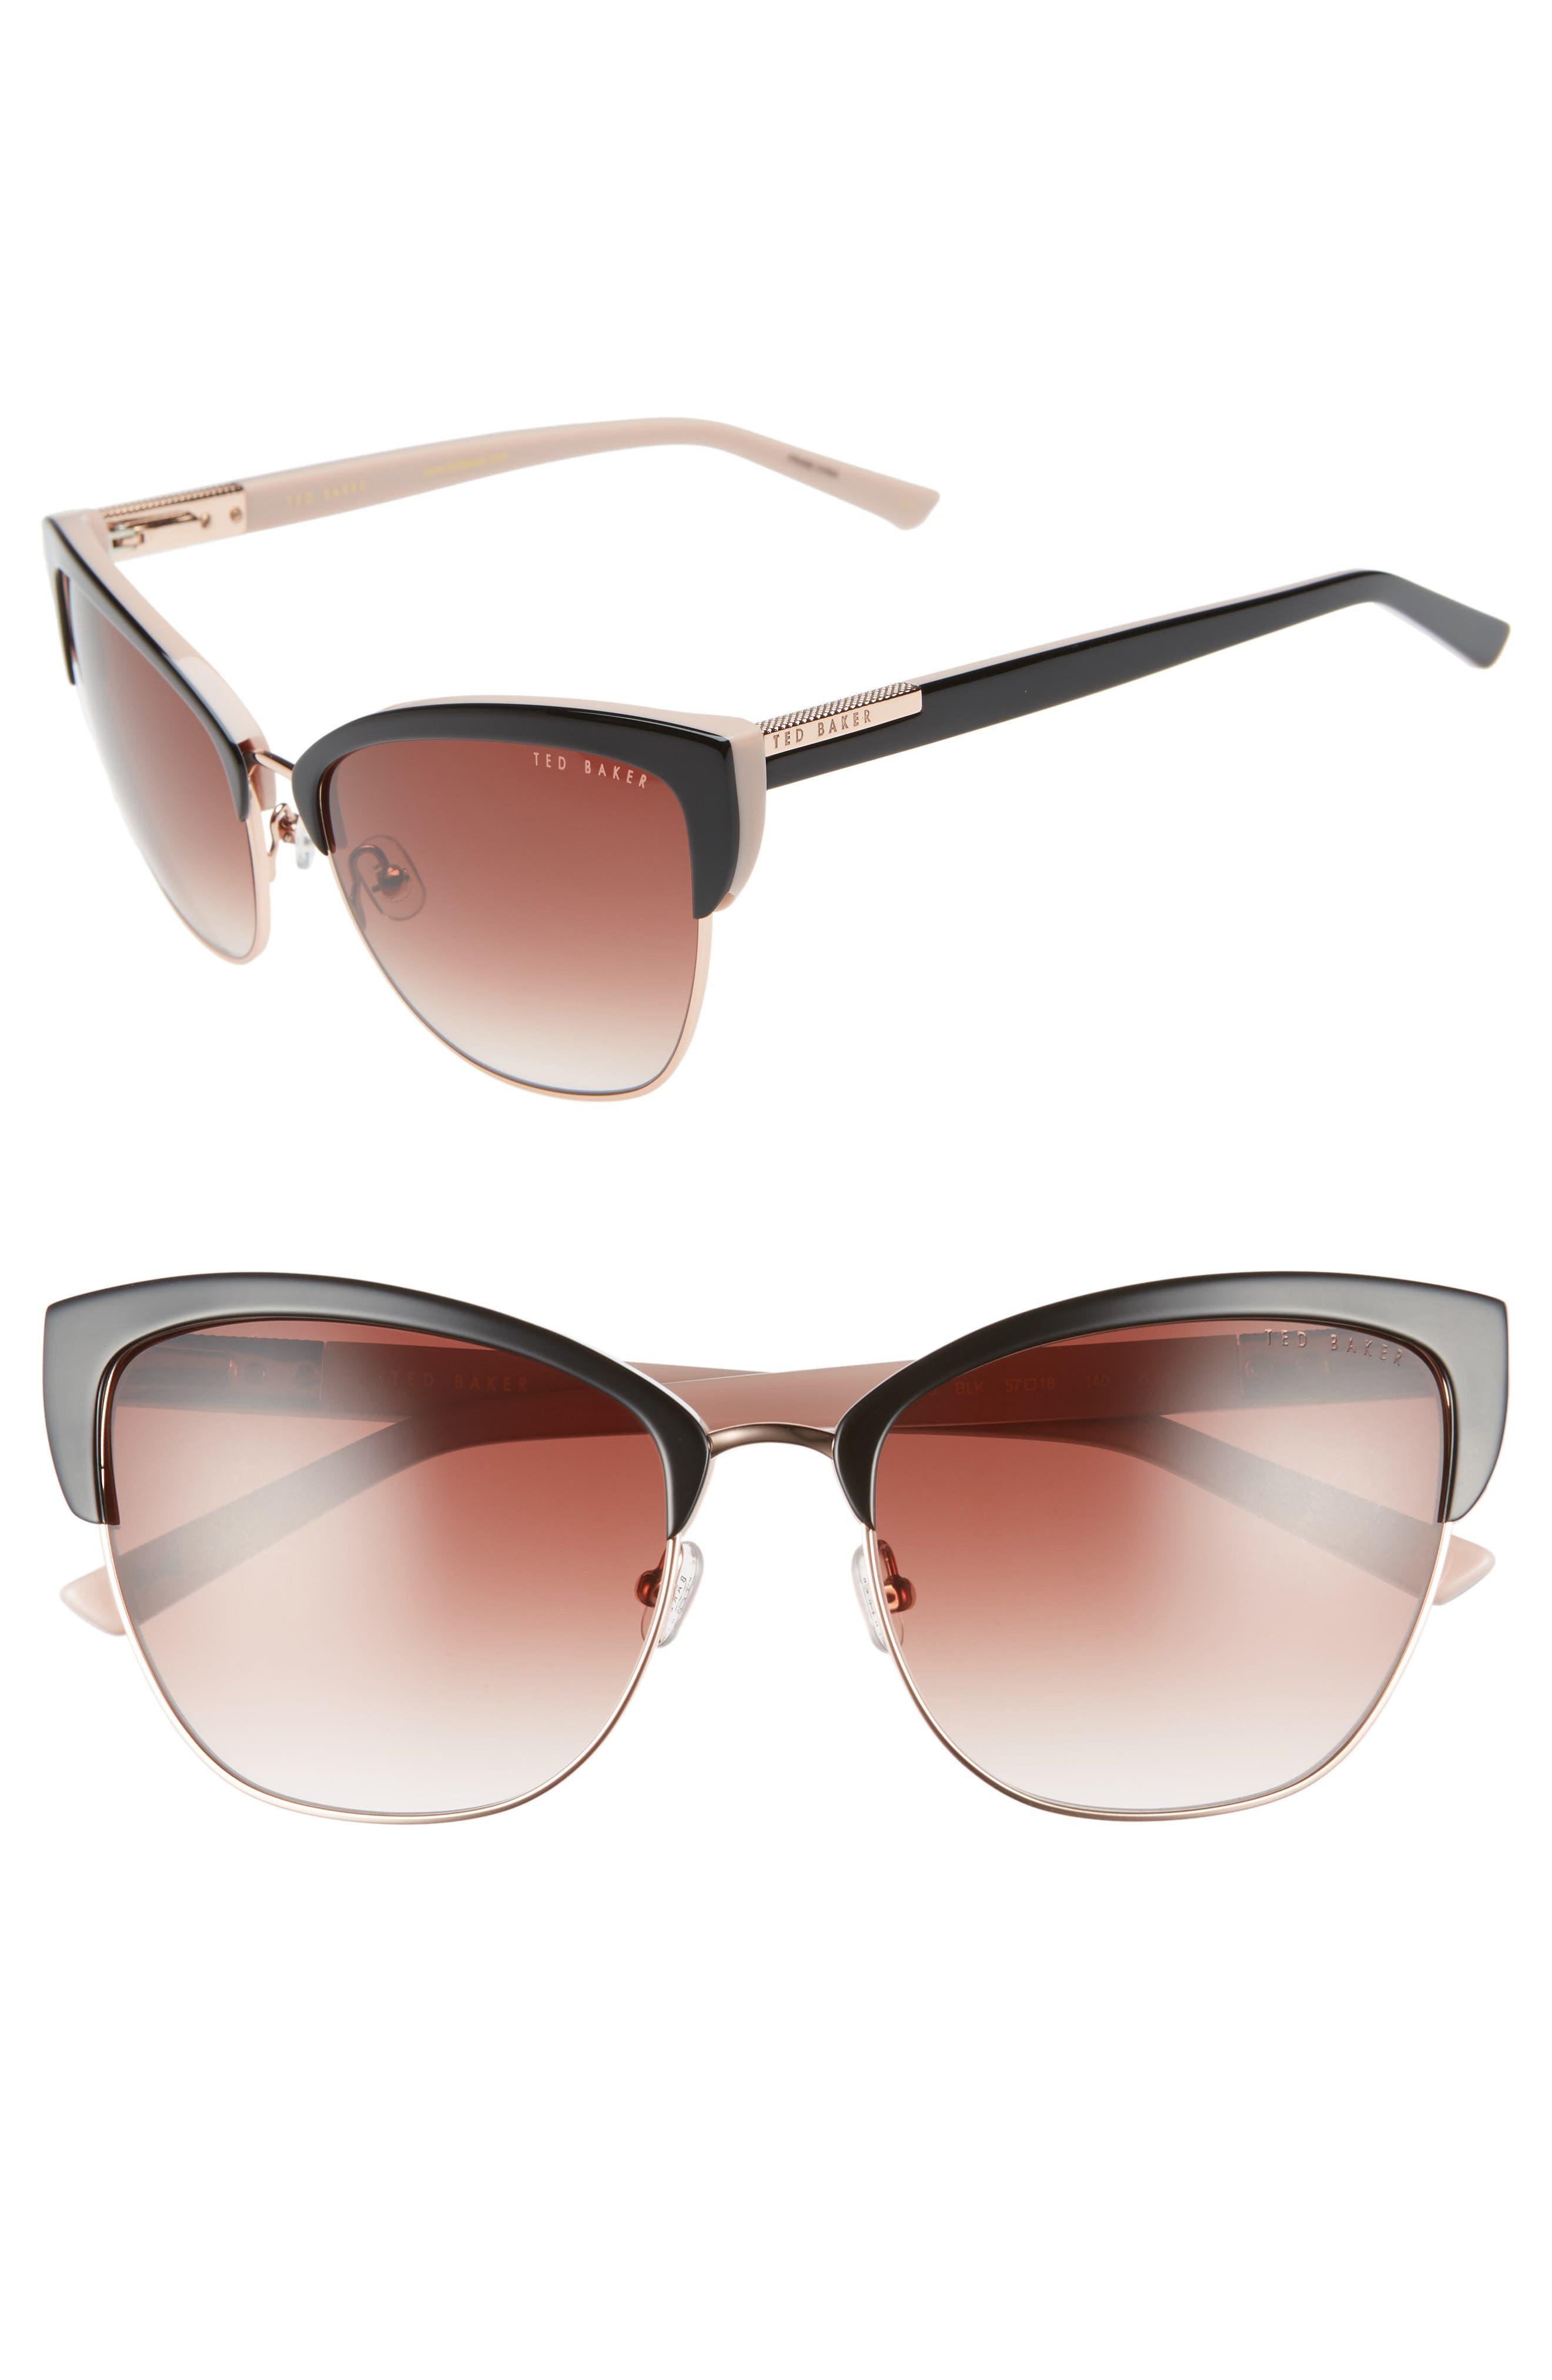 57mm Cat Eye Sunglasses,                             Main thumbnail 1, color,                             BLACK